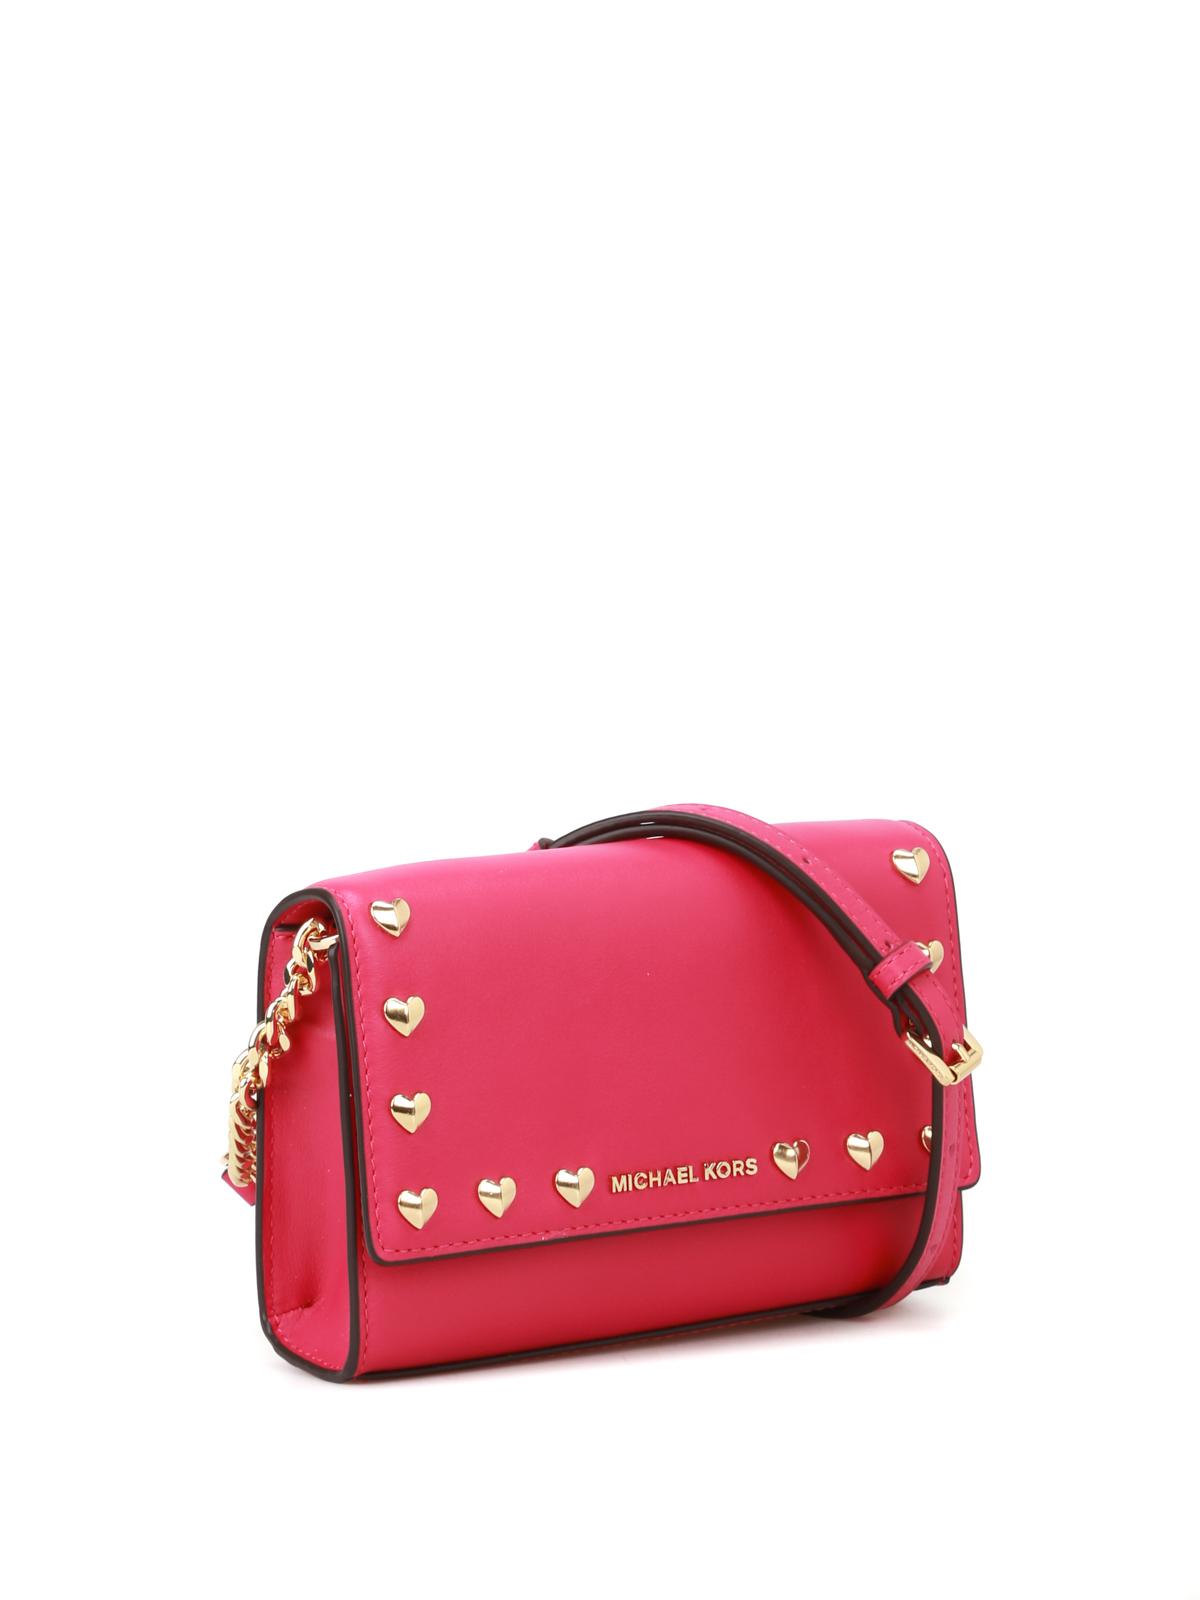 dad475997f54 MICHAEL KORS  cross body bags online - Ruby heart-studs fuchsia crossbody